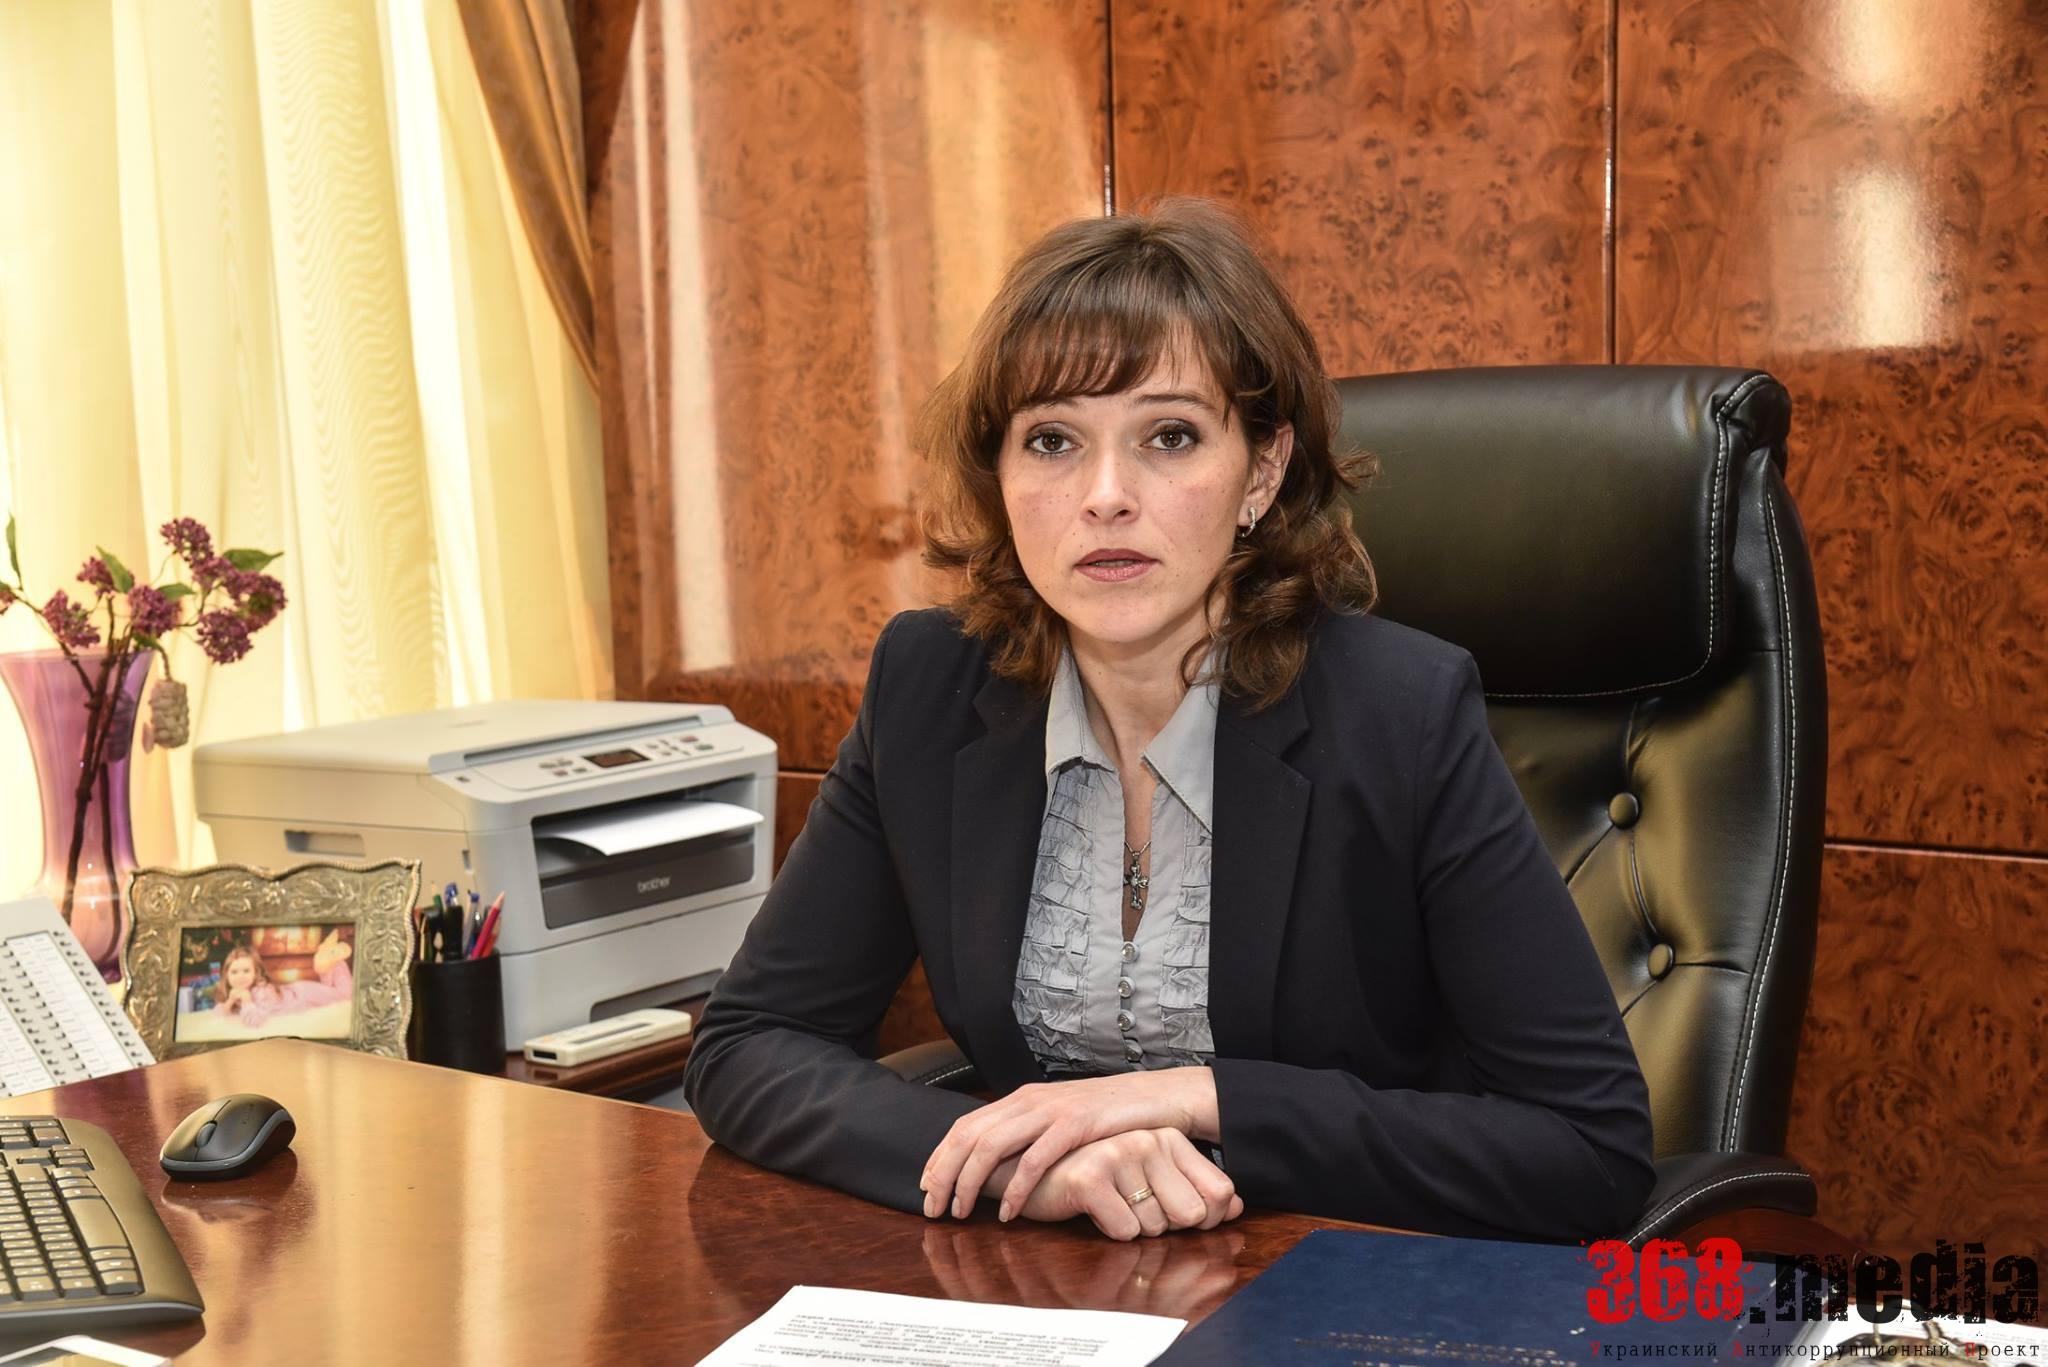 «Огорчу вас, но я не дочь генпрокурора» — Татьяна Горностаева